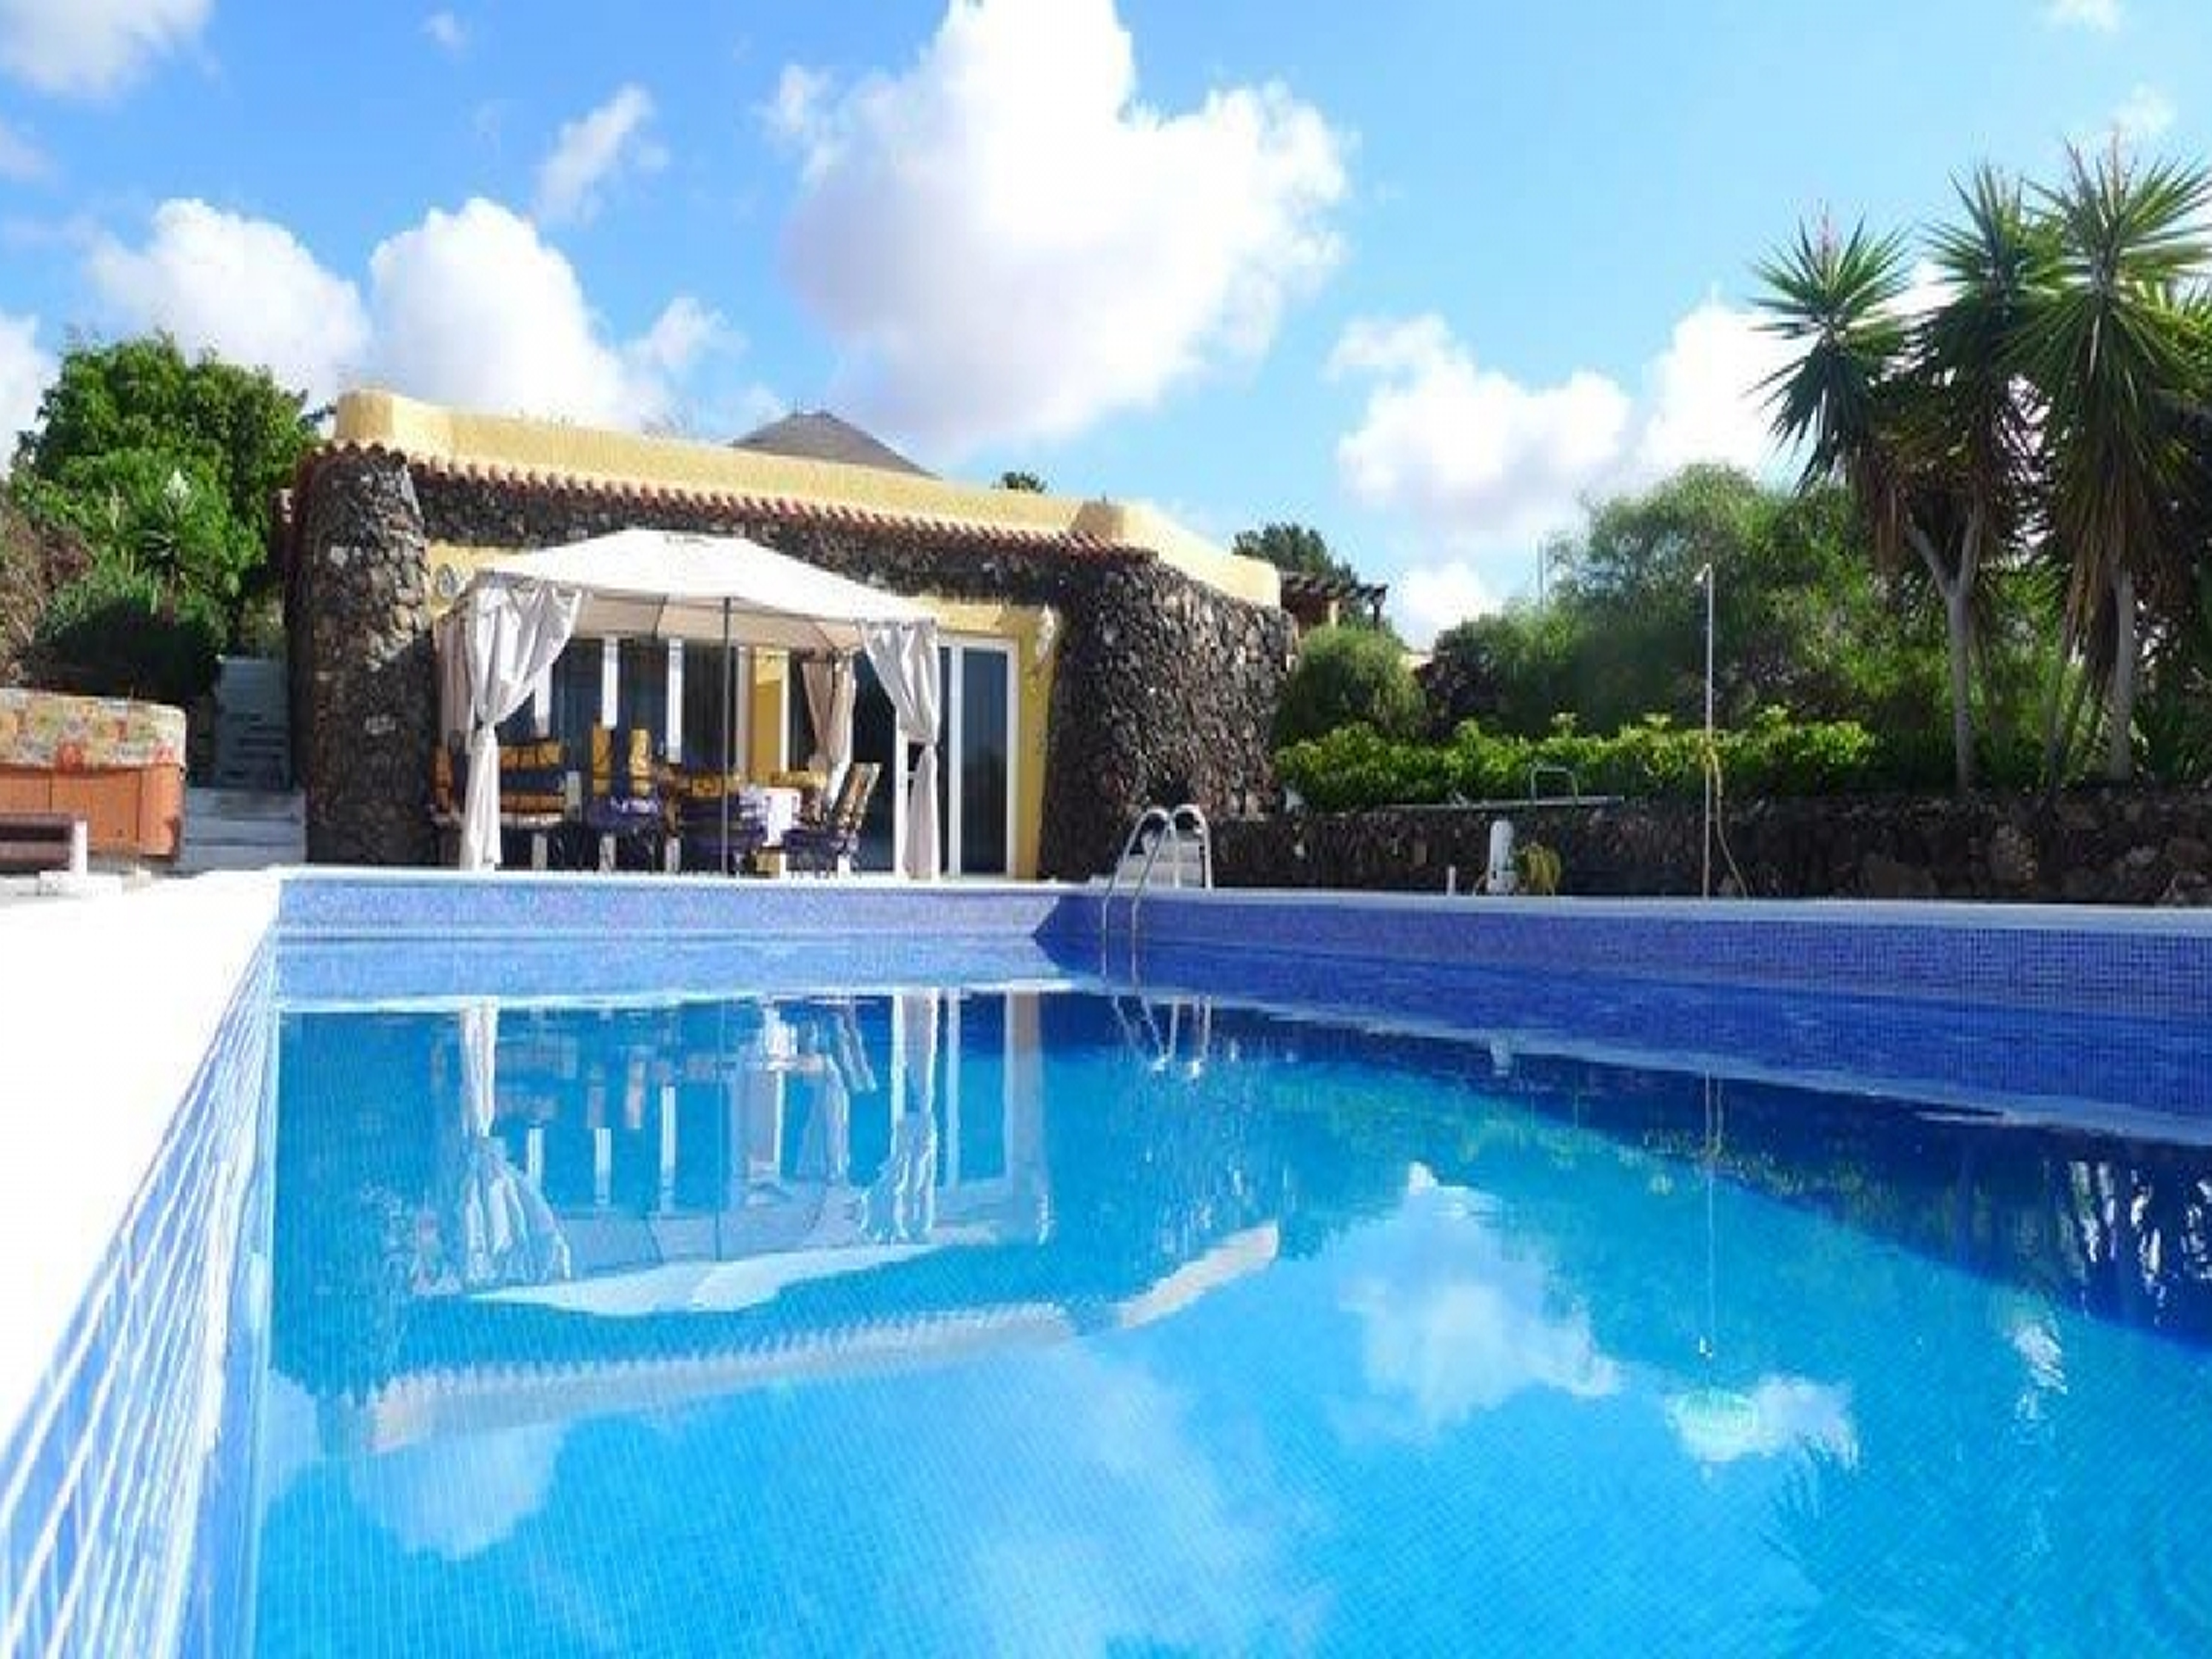 Finca Toredo groser beheizter Pool, Whirlpool, Bar Villa in Spanien